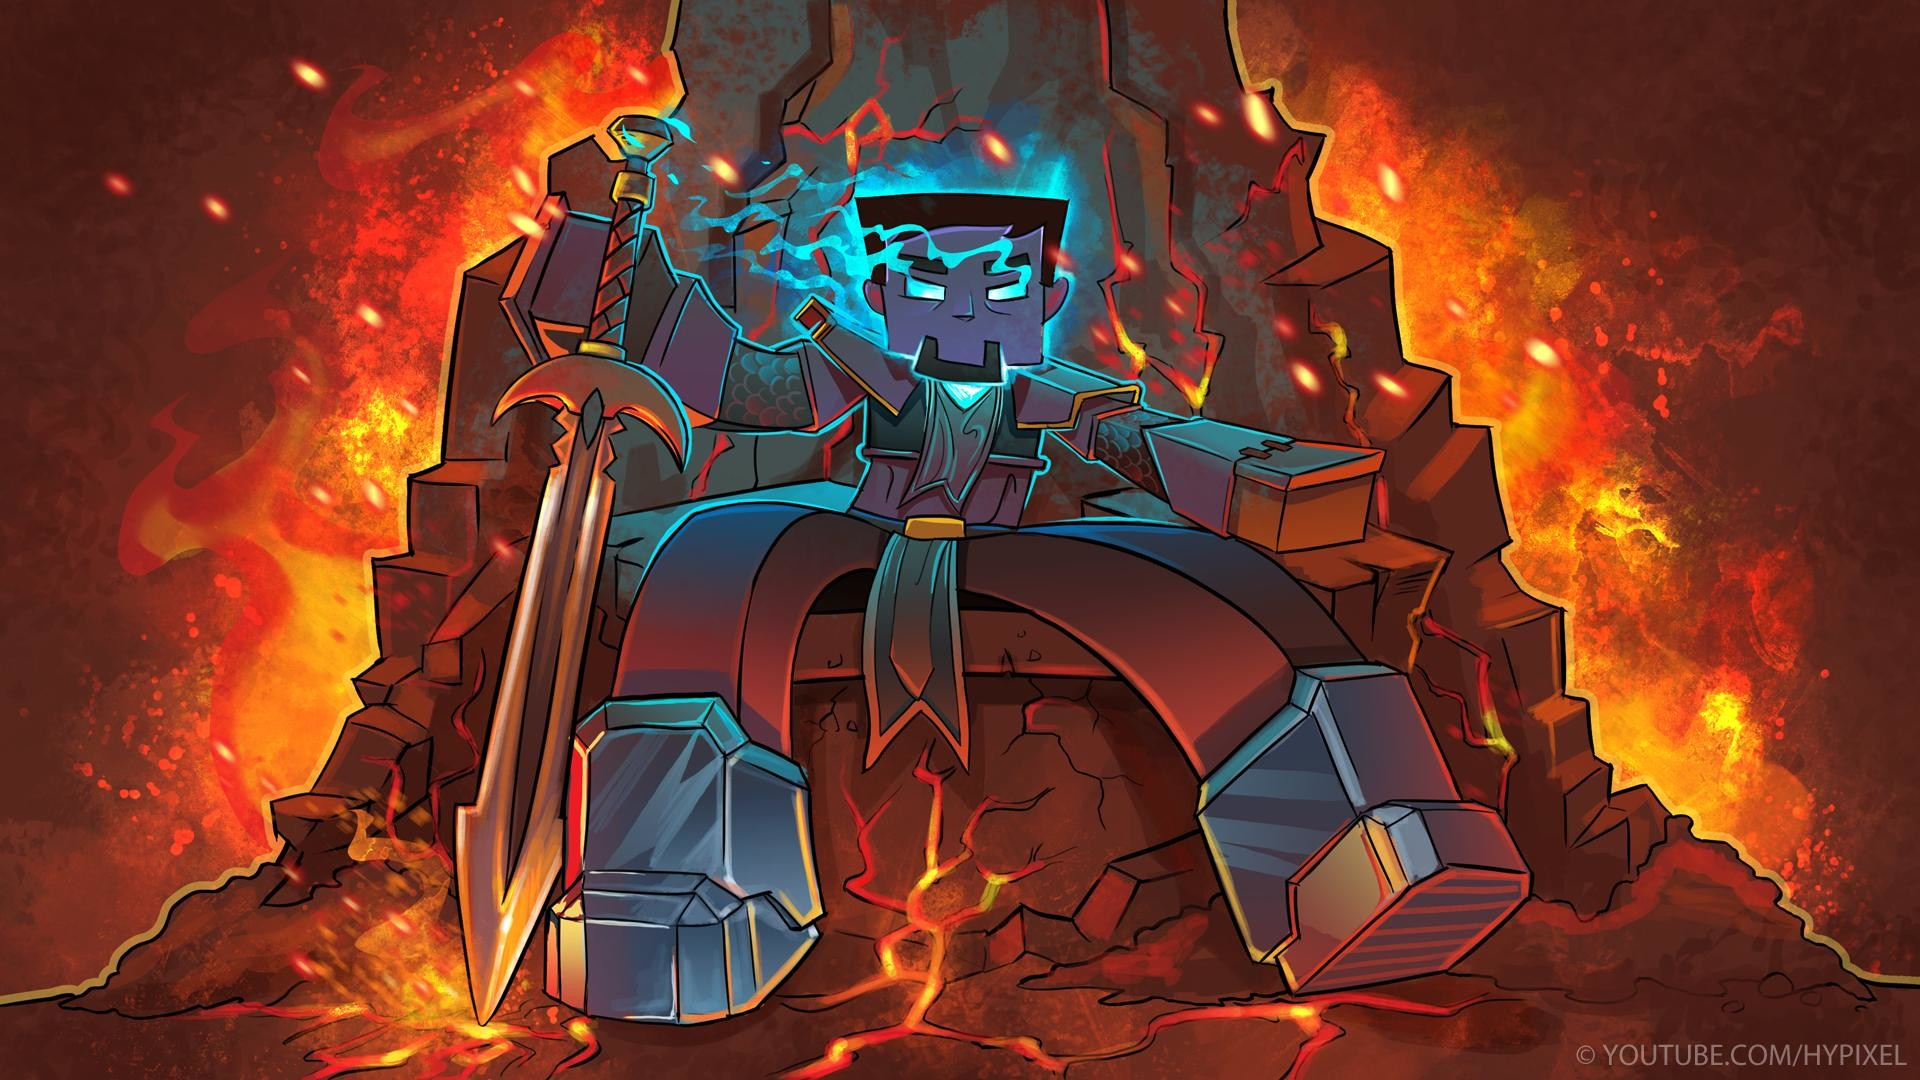 Fantastic Wallpaper Minecraft Art - 1016640-top-minecraft-background-1920x1080-for-4k  Image_988176.jpg